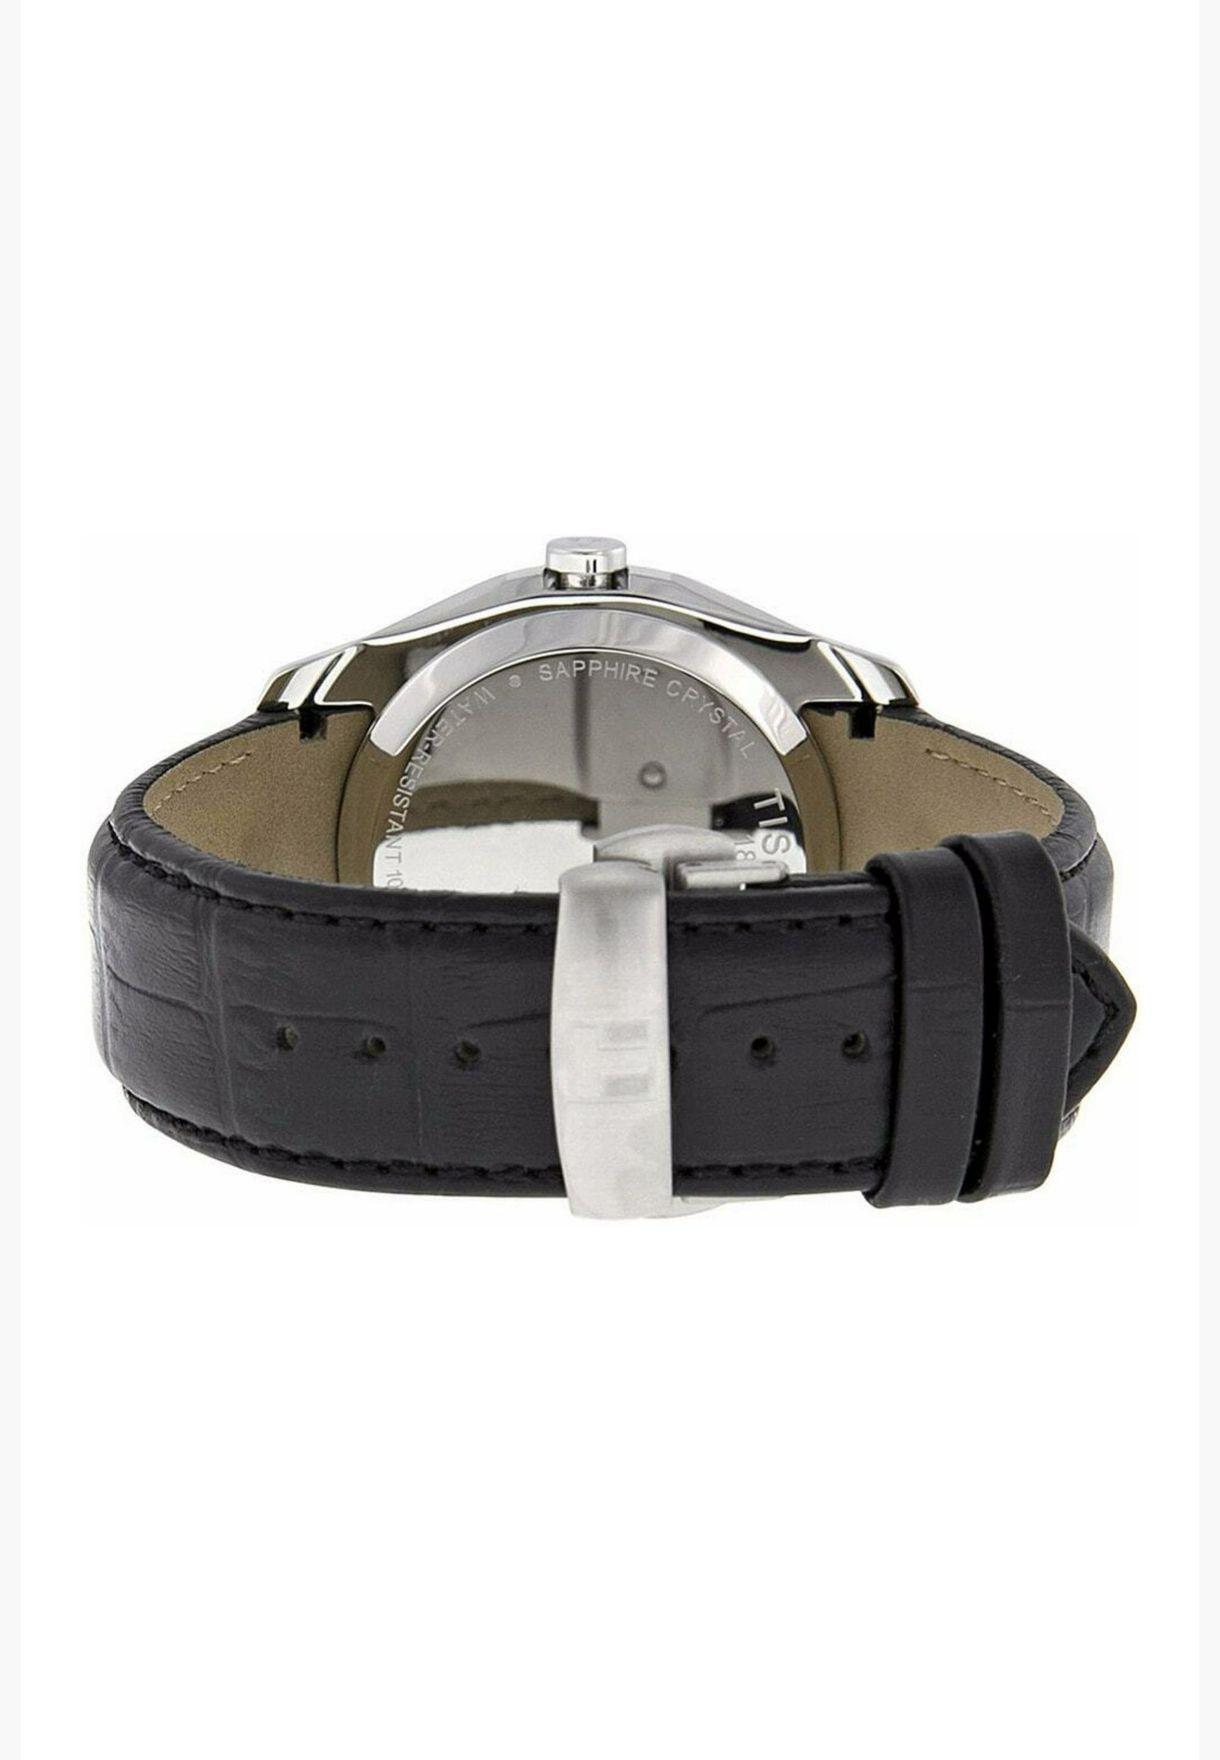 ساعة تيسو كوتورييه كوارتز بسوار جلدي - T035.446.16.051.00